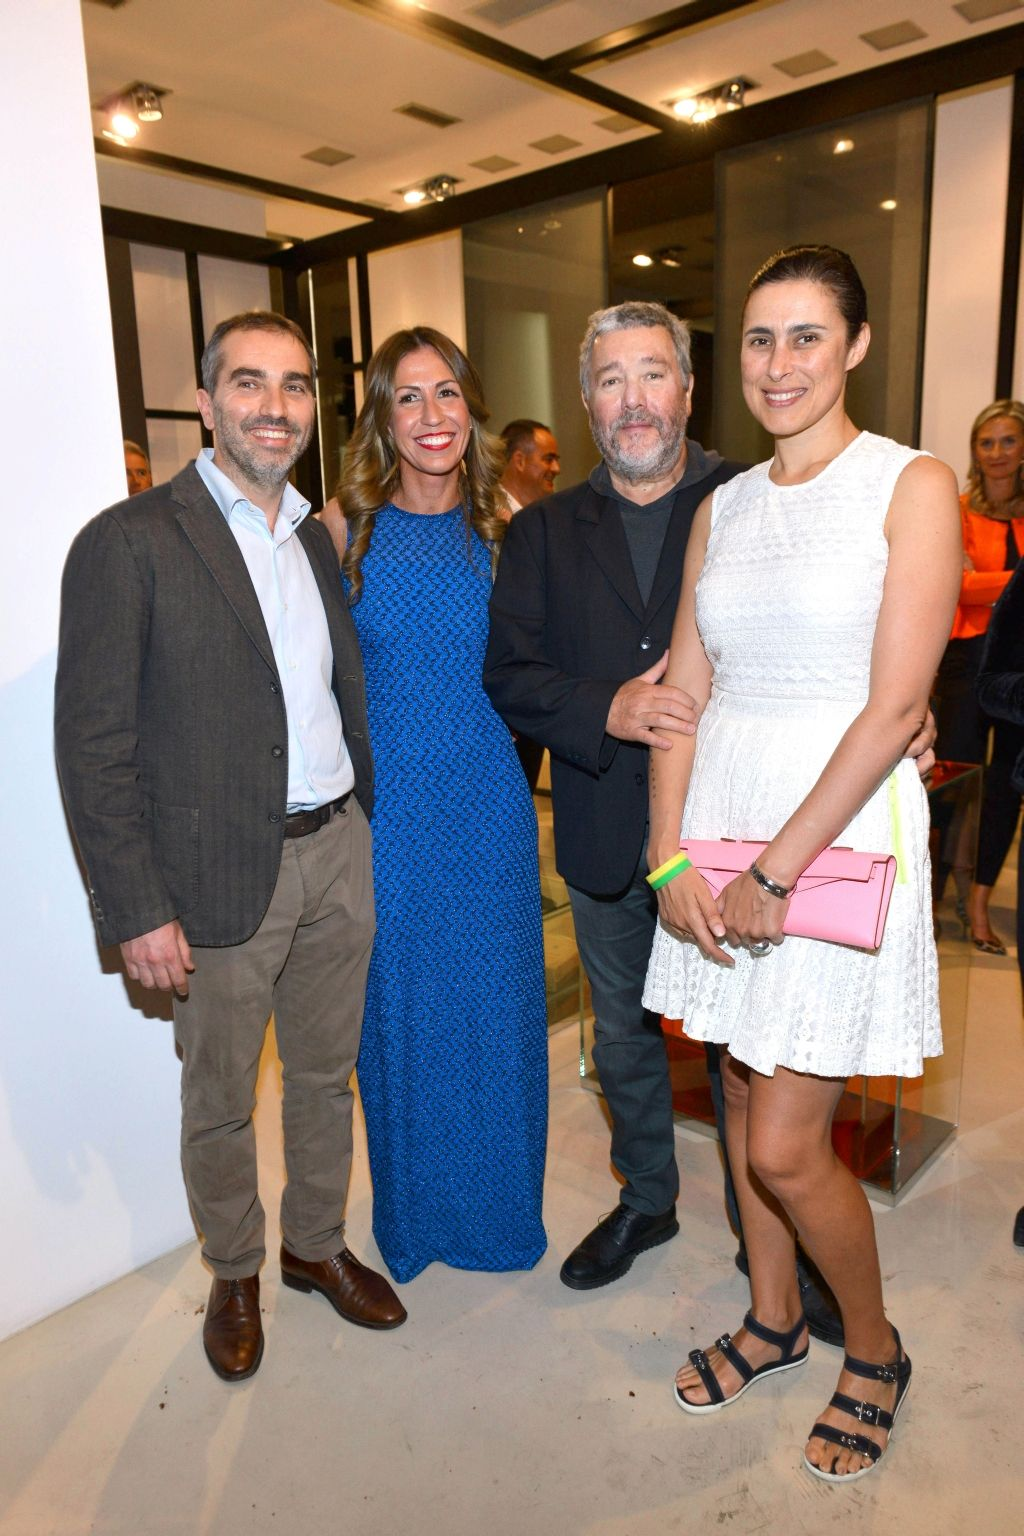 #LorenzoArosio, #SilviaGorlini, #PhilippeStarck, #JasmineStarck #Salone2015 #GLASITALIA cocktail at Flagship Store Milano - Via Santa Sofia | April 15, 2015